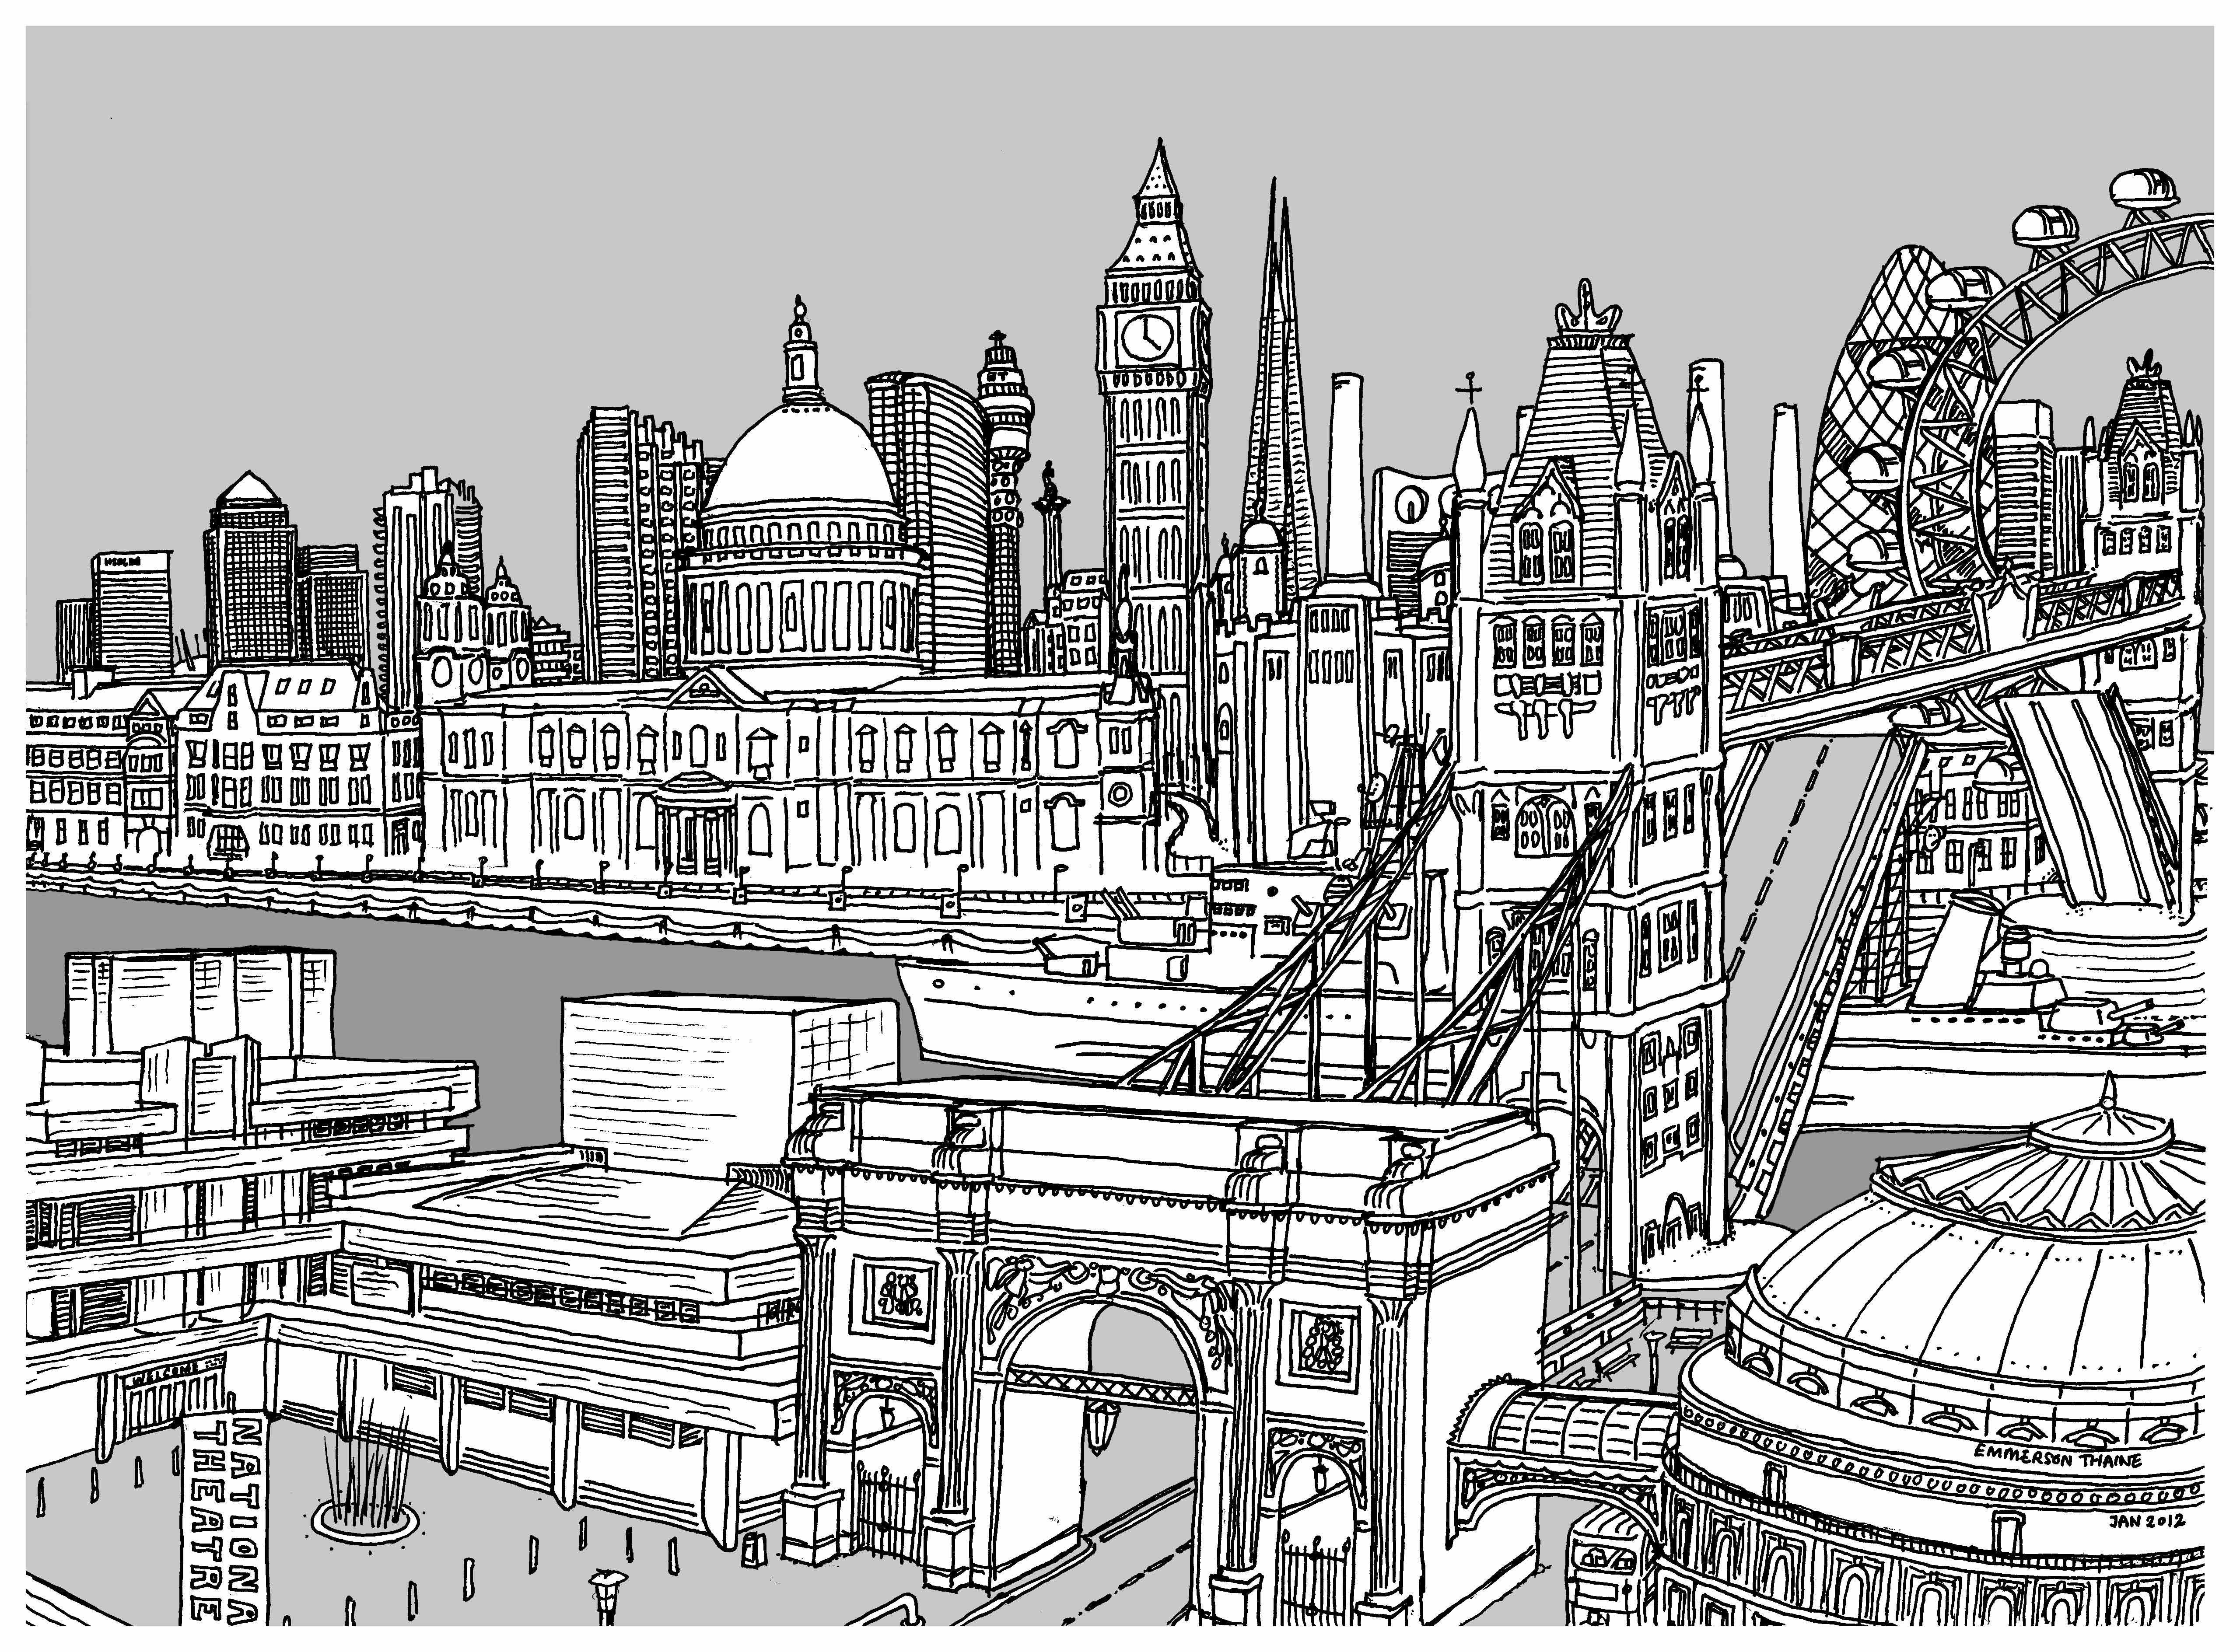 Line Art Limited : City rise b w indigo print line drawing a